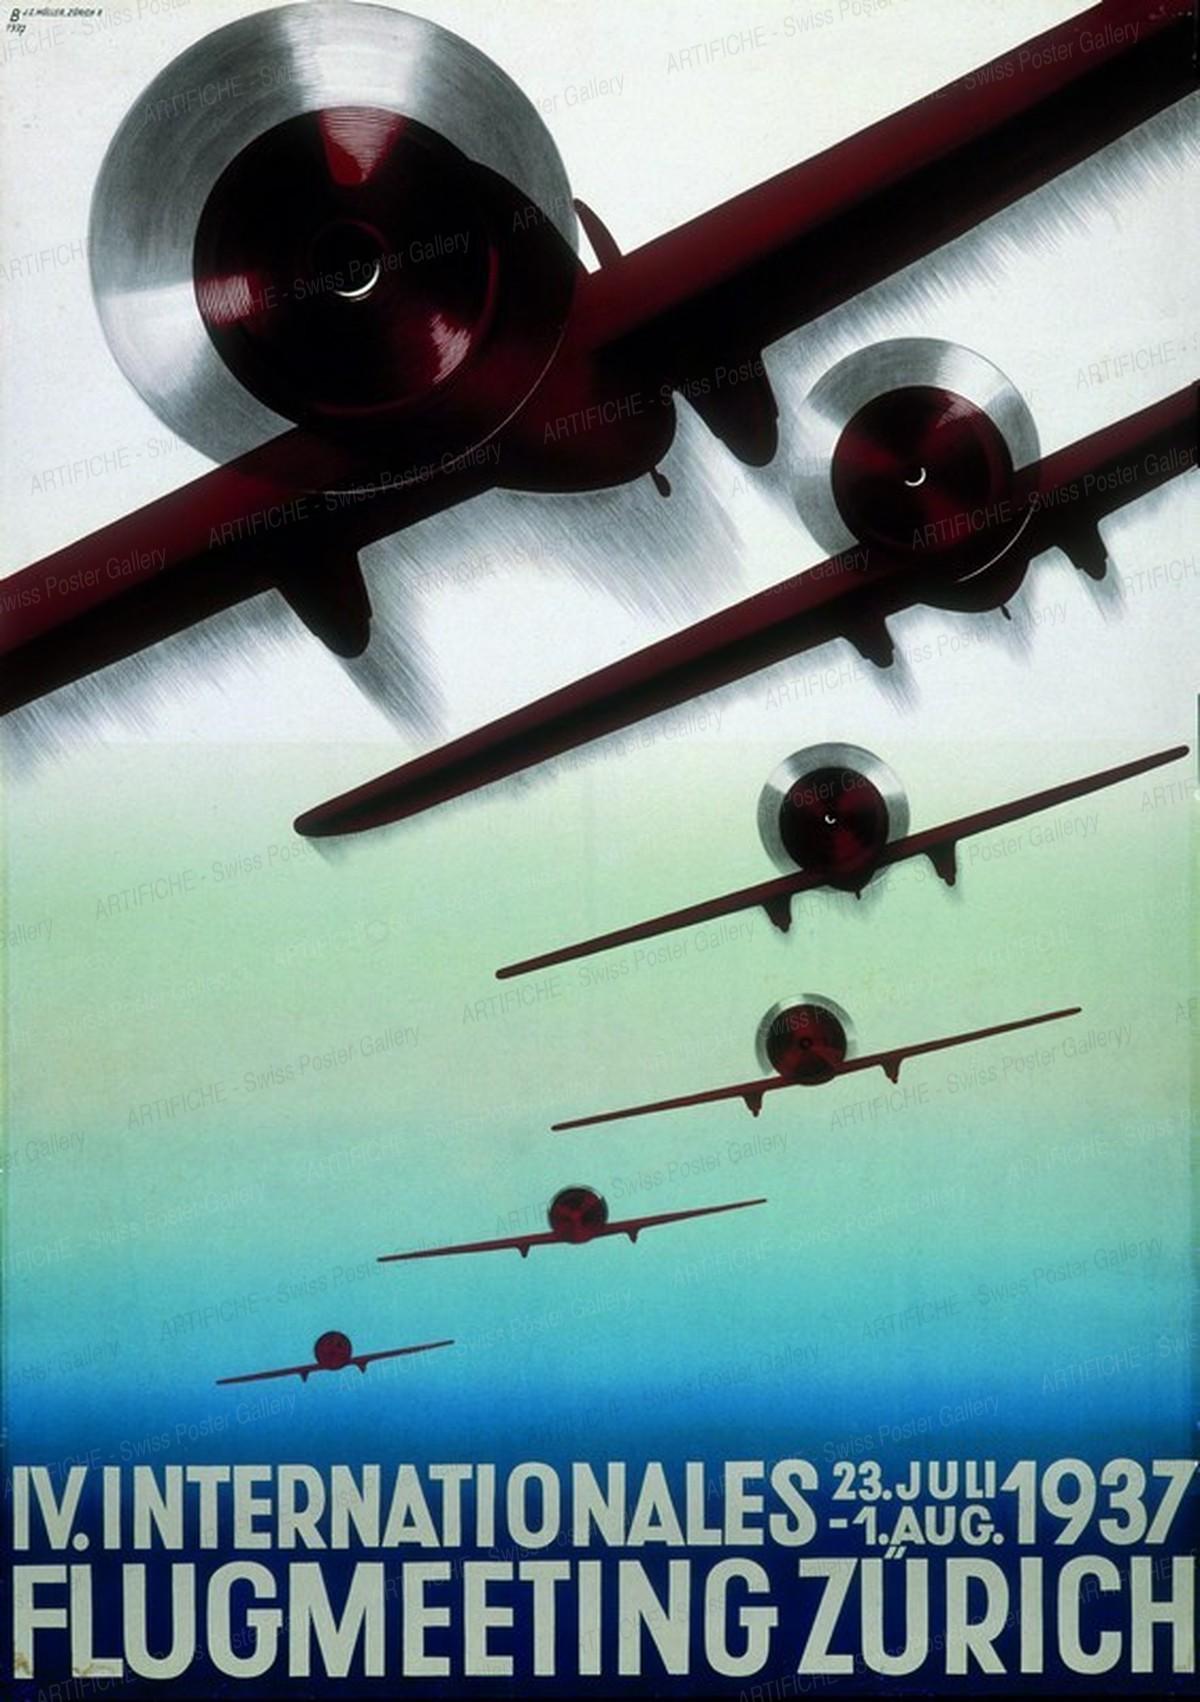 IV. INTERNATIONALES FLUGMEETING ZÜRICH 1937, Otto Baumberger